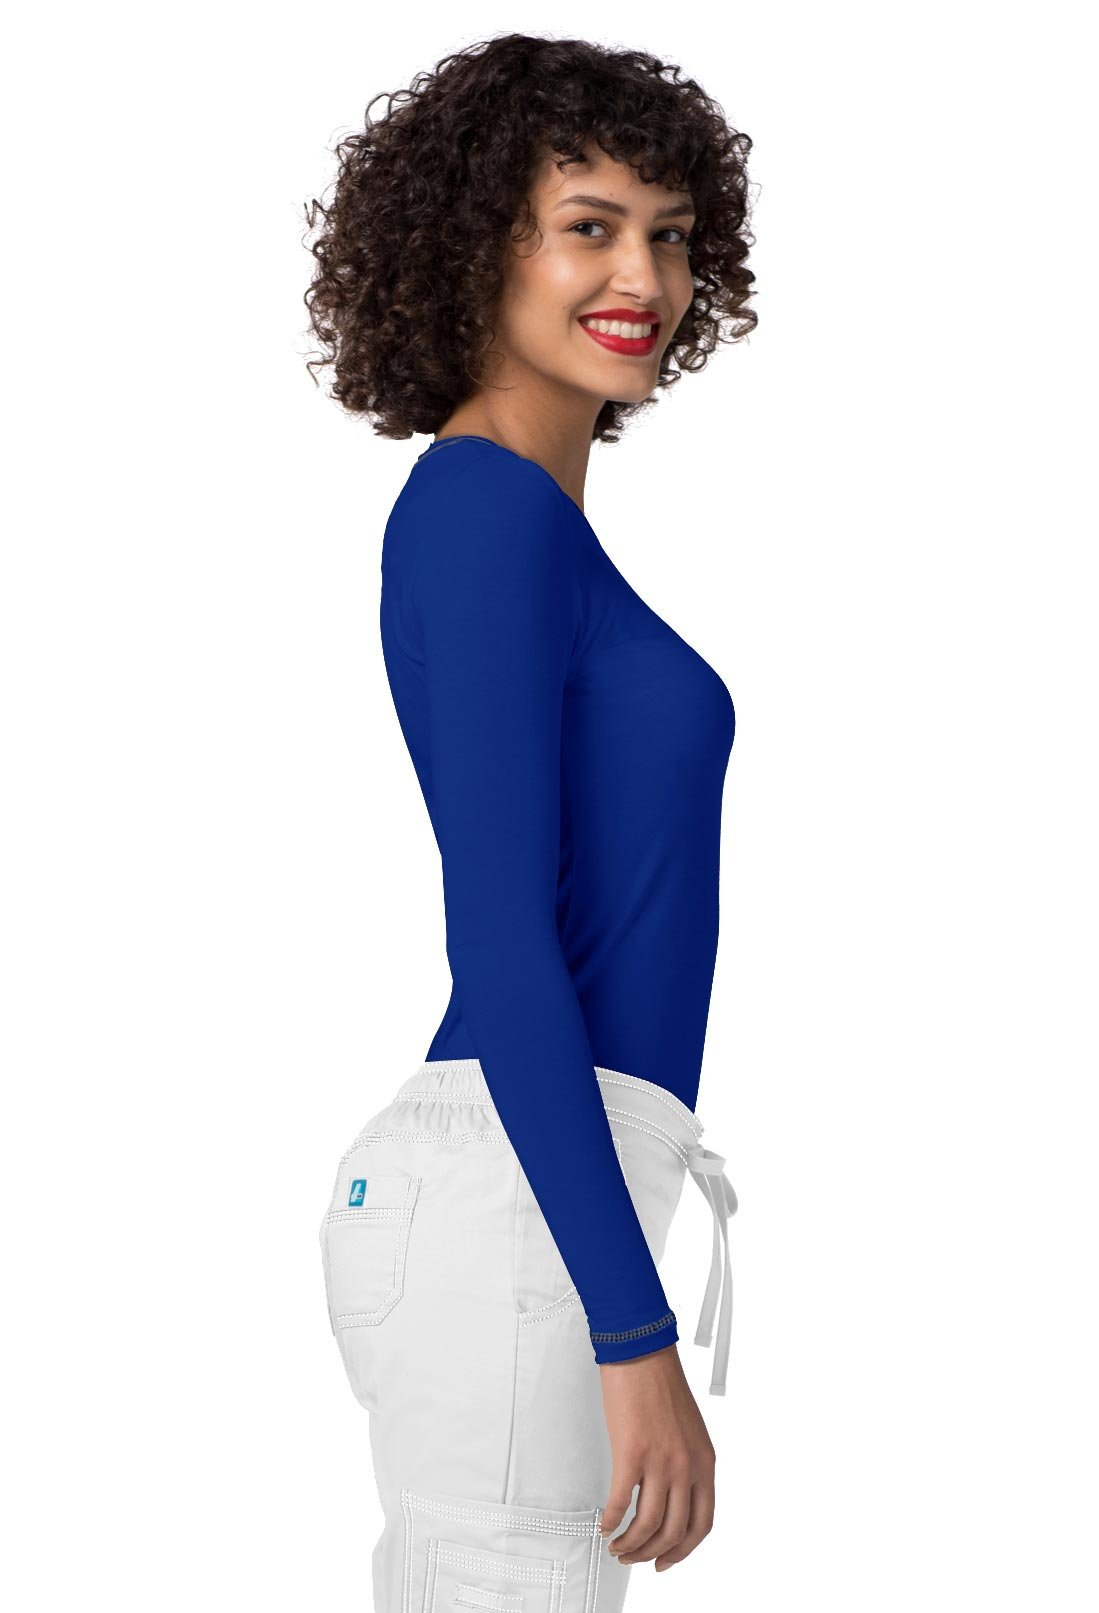 Adar Womens Comfort Long Sleeve Fitted T-Shirt Underscrub Tee- 3400 - Royal Blue - L by ADAR UNIFORMS (Image #5)